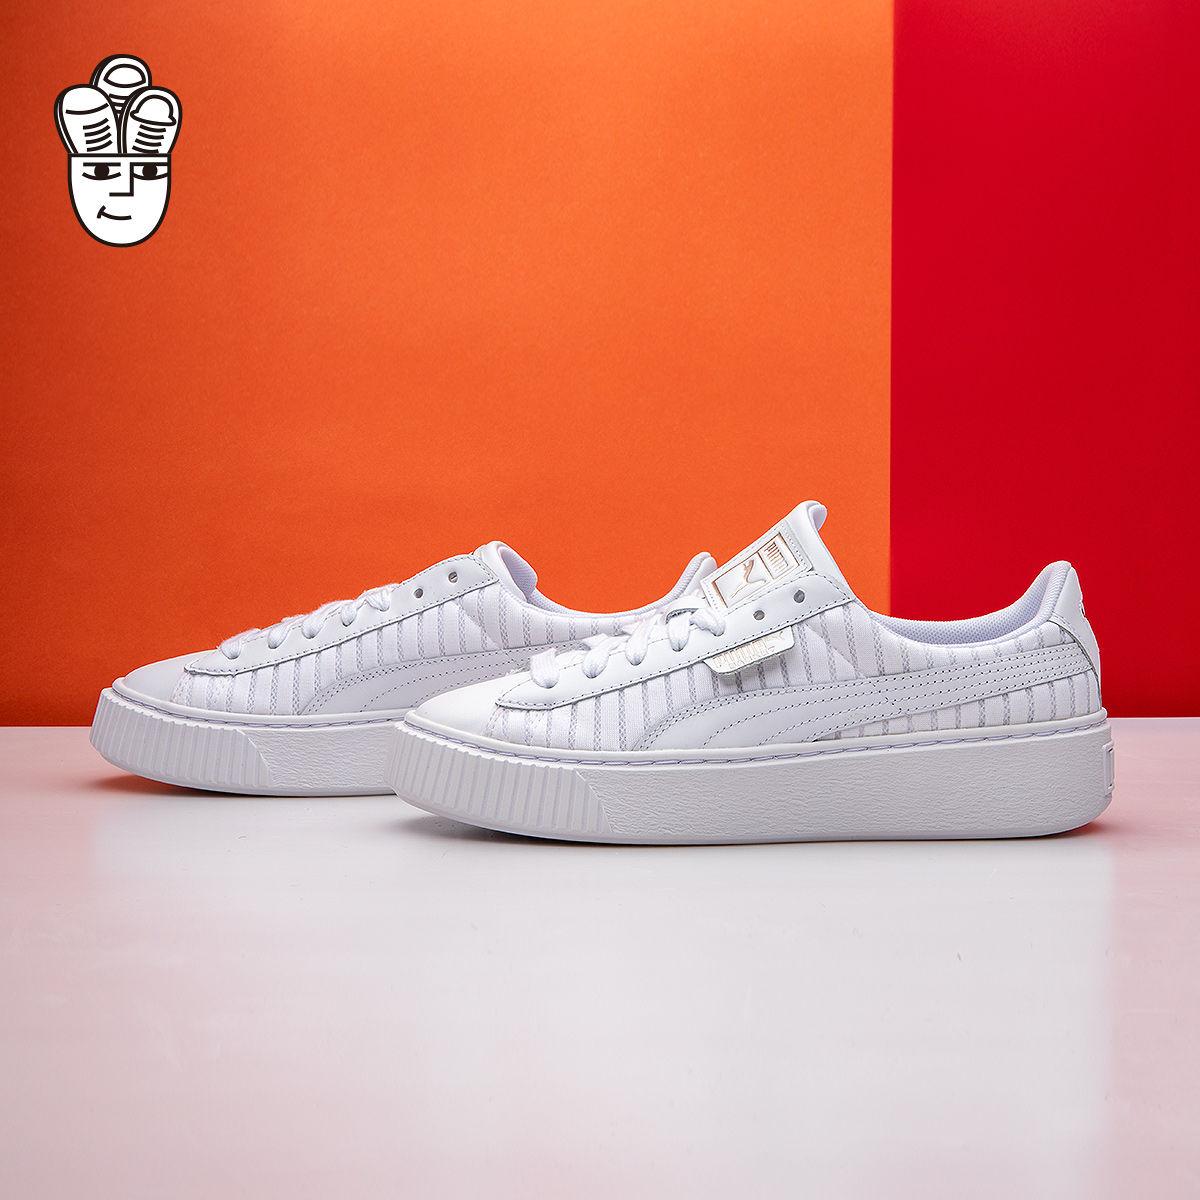 Puma Basket Platform EP 彪马女鞋 厚底松糕鞋 低帮休闲鞋板鞋